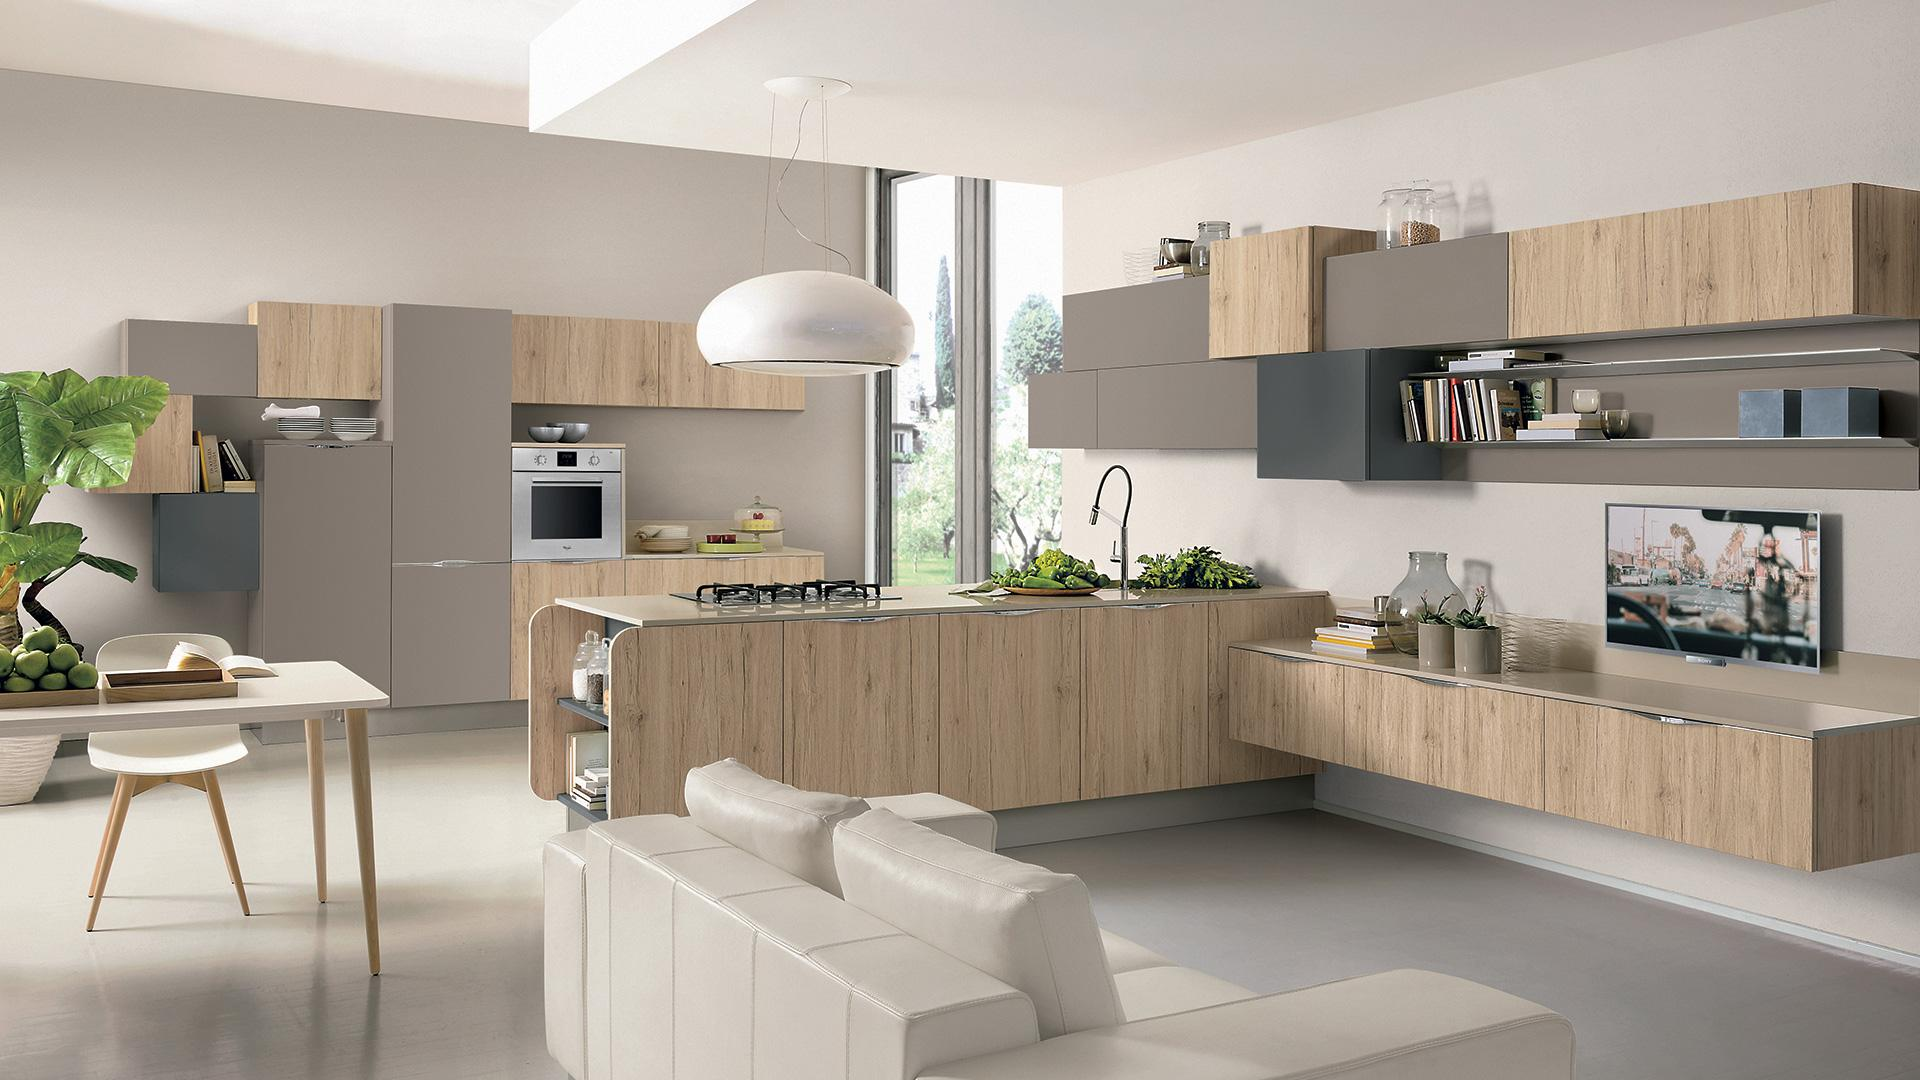 Negozi cucine milano elegant negozi cucine milano with - Cucine country milano ...